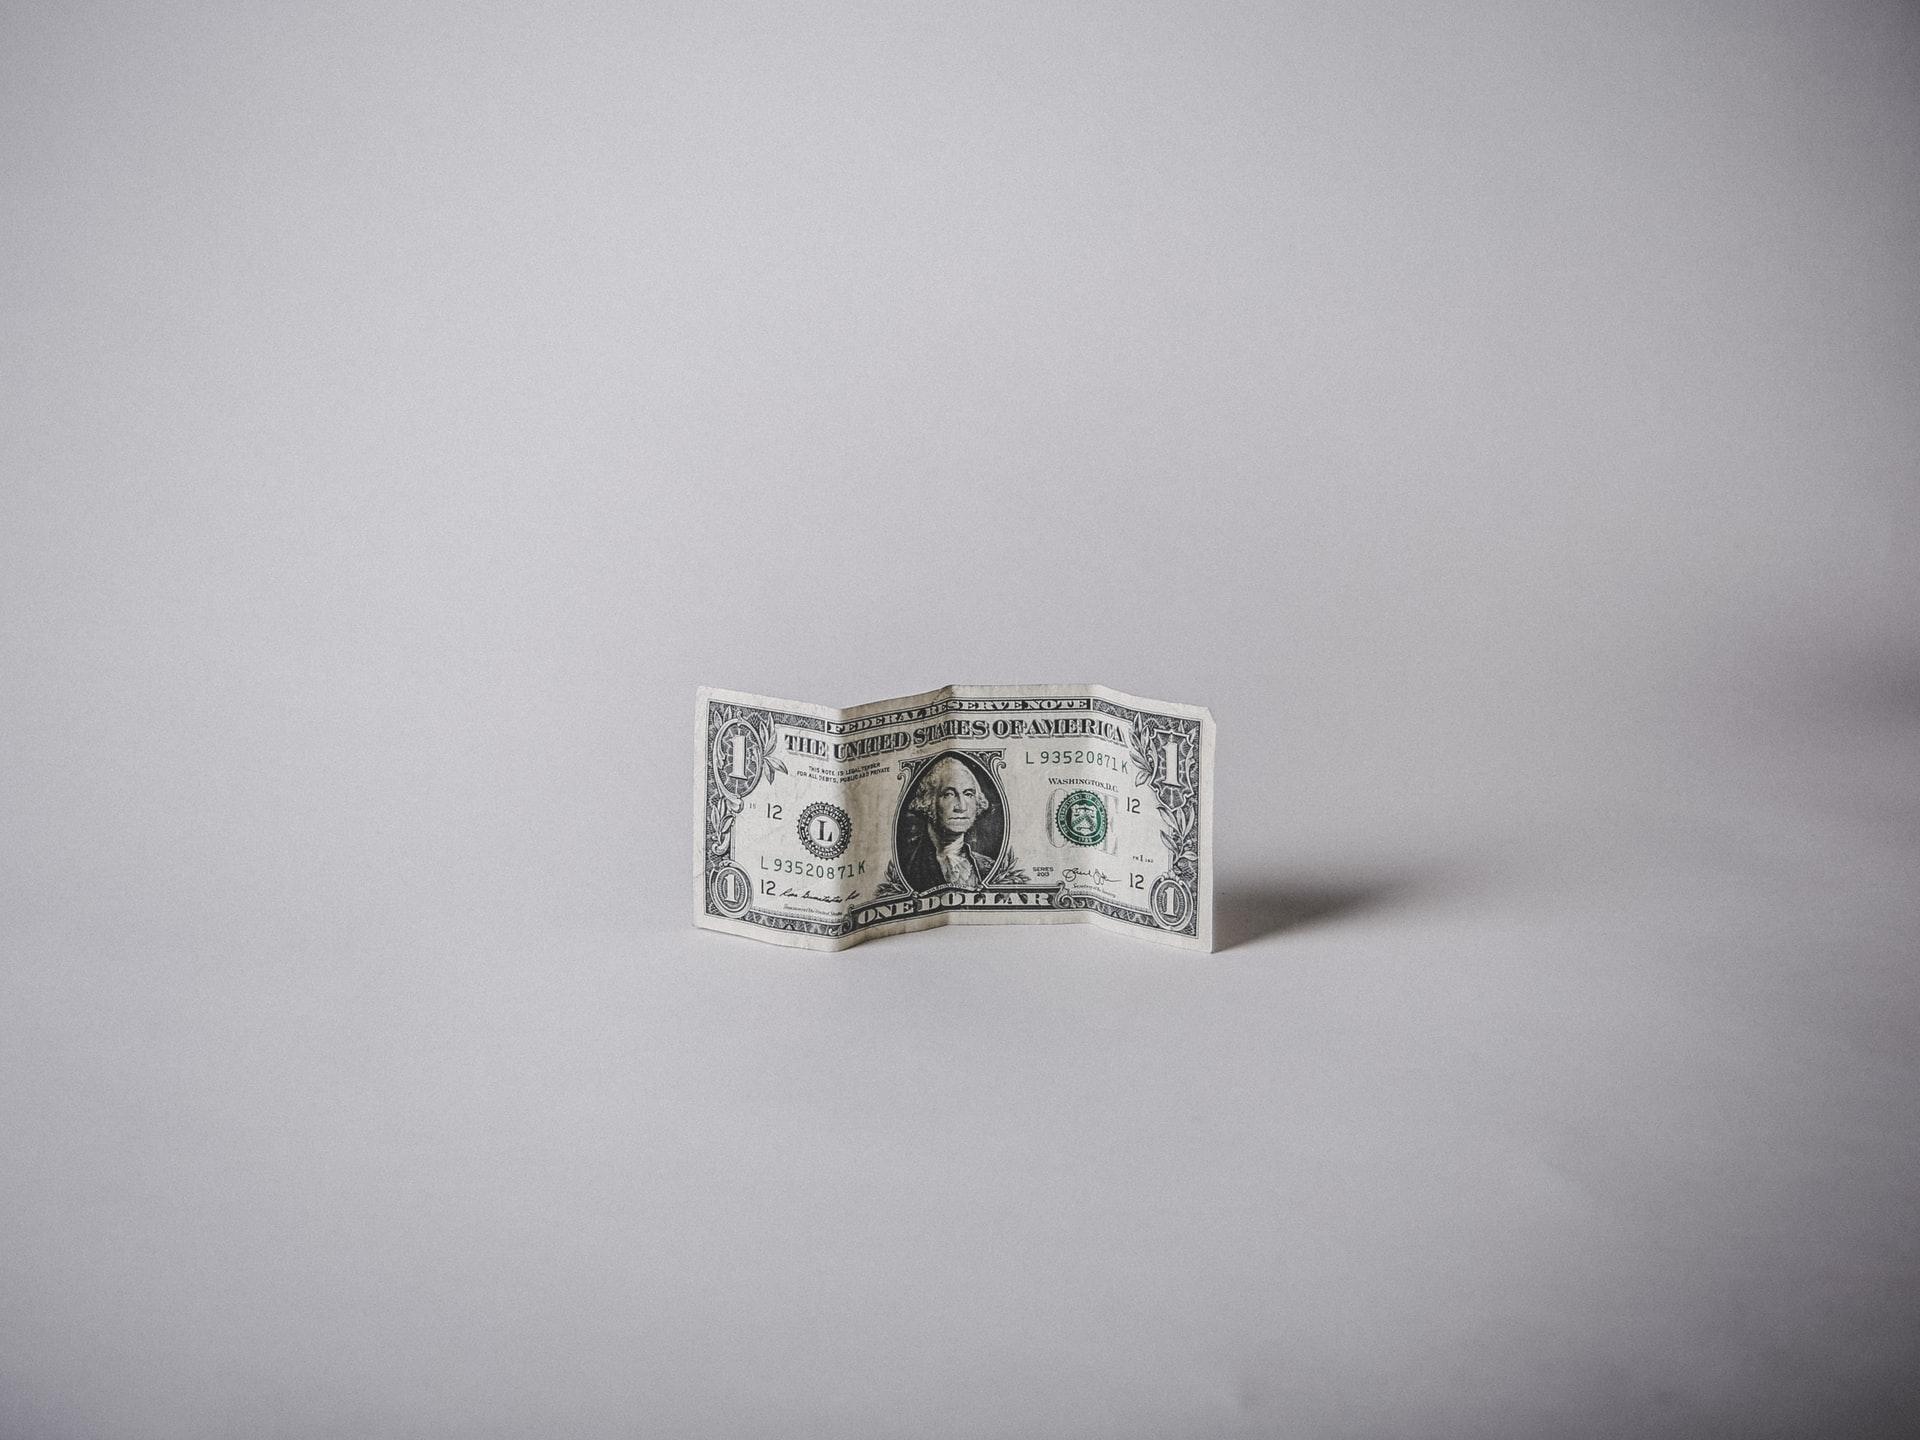 Currency Depreciations Worsens Inflation across Emerging Markets Brandspurng